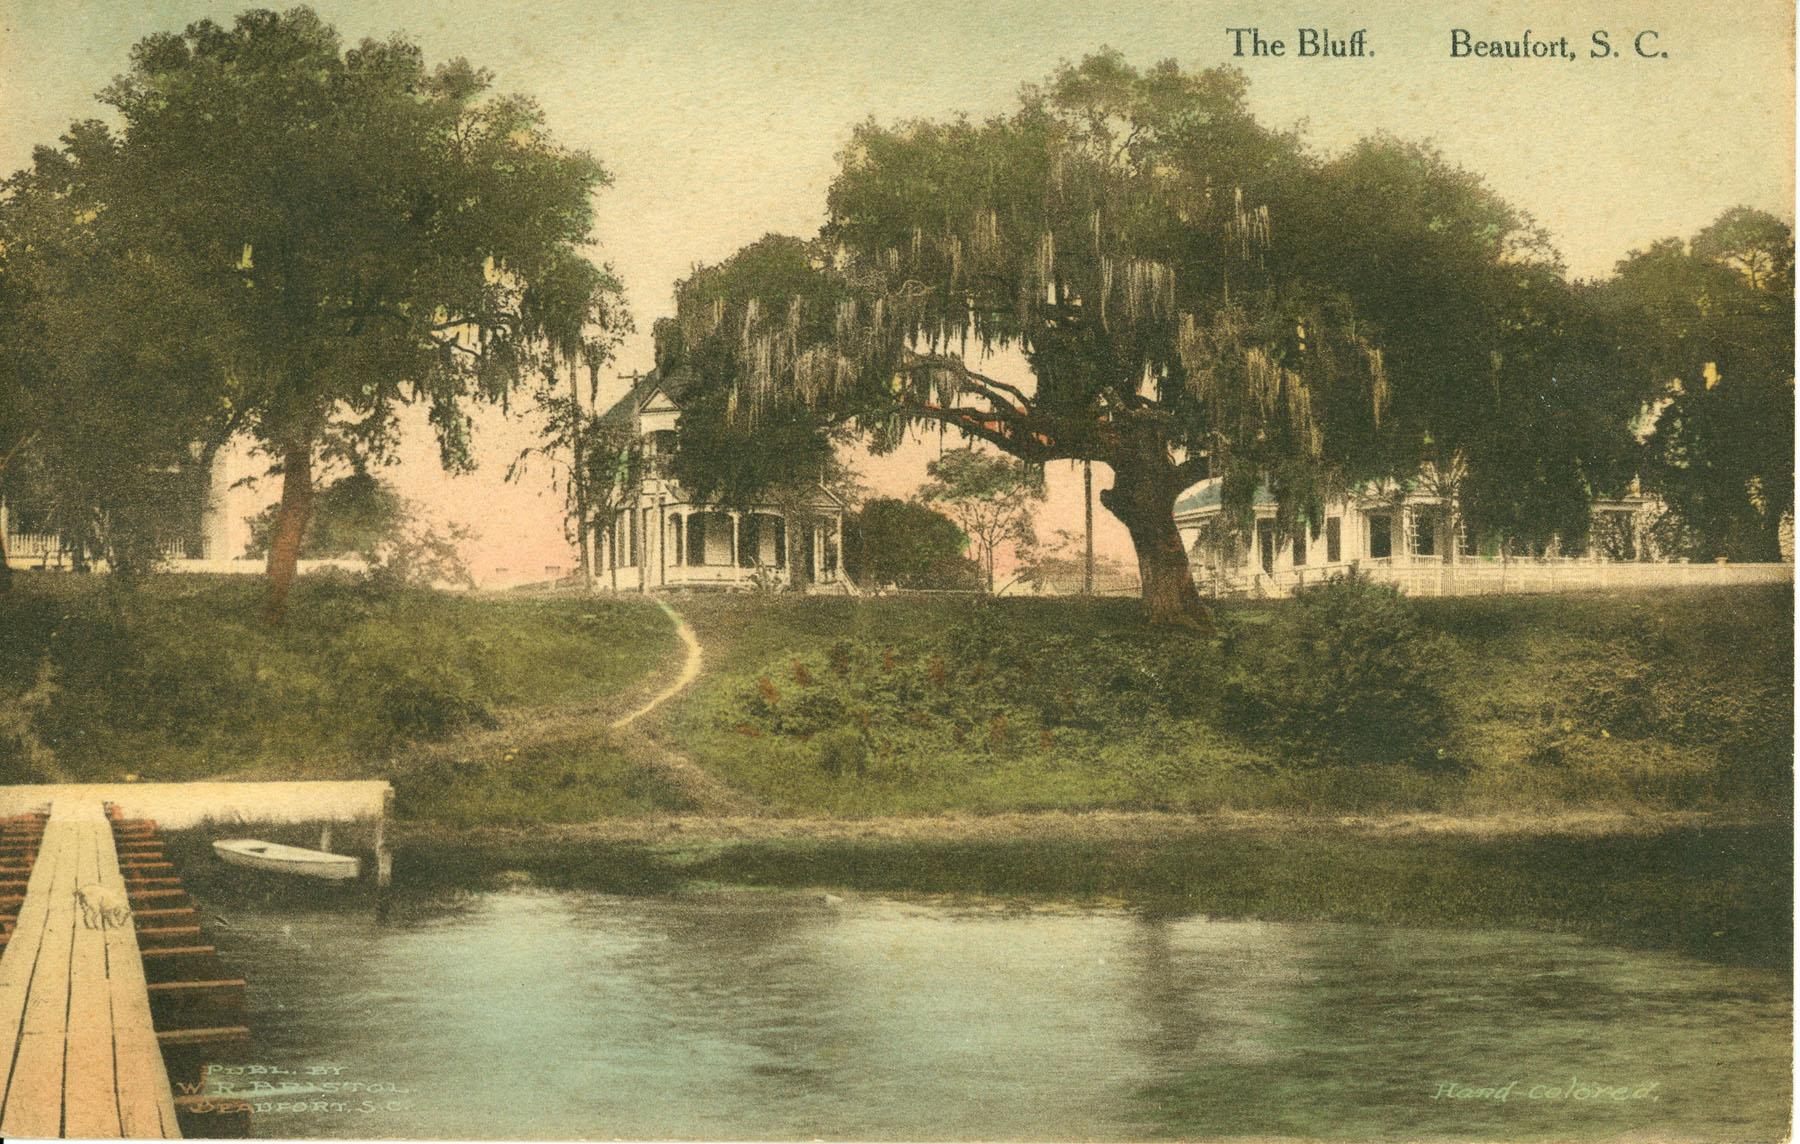 The Bluff in Beaufort